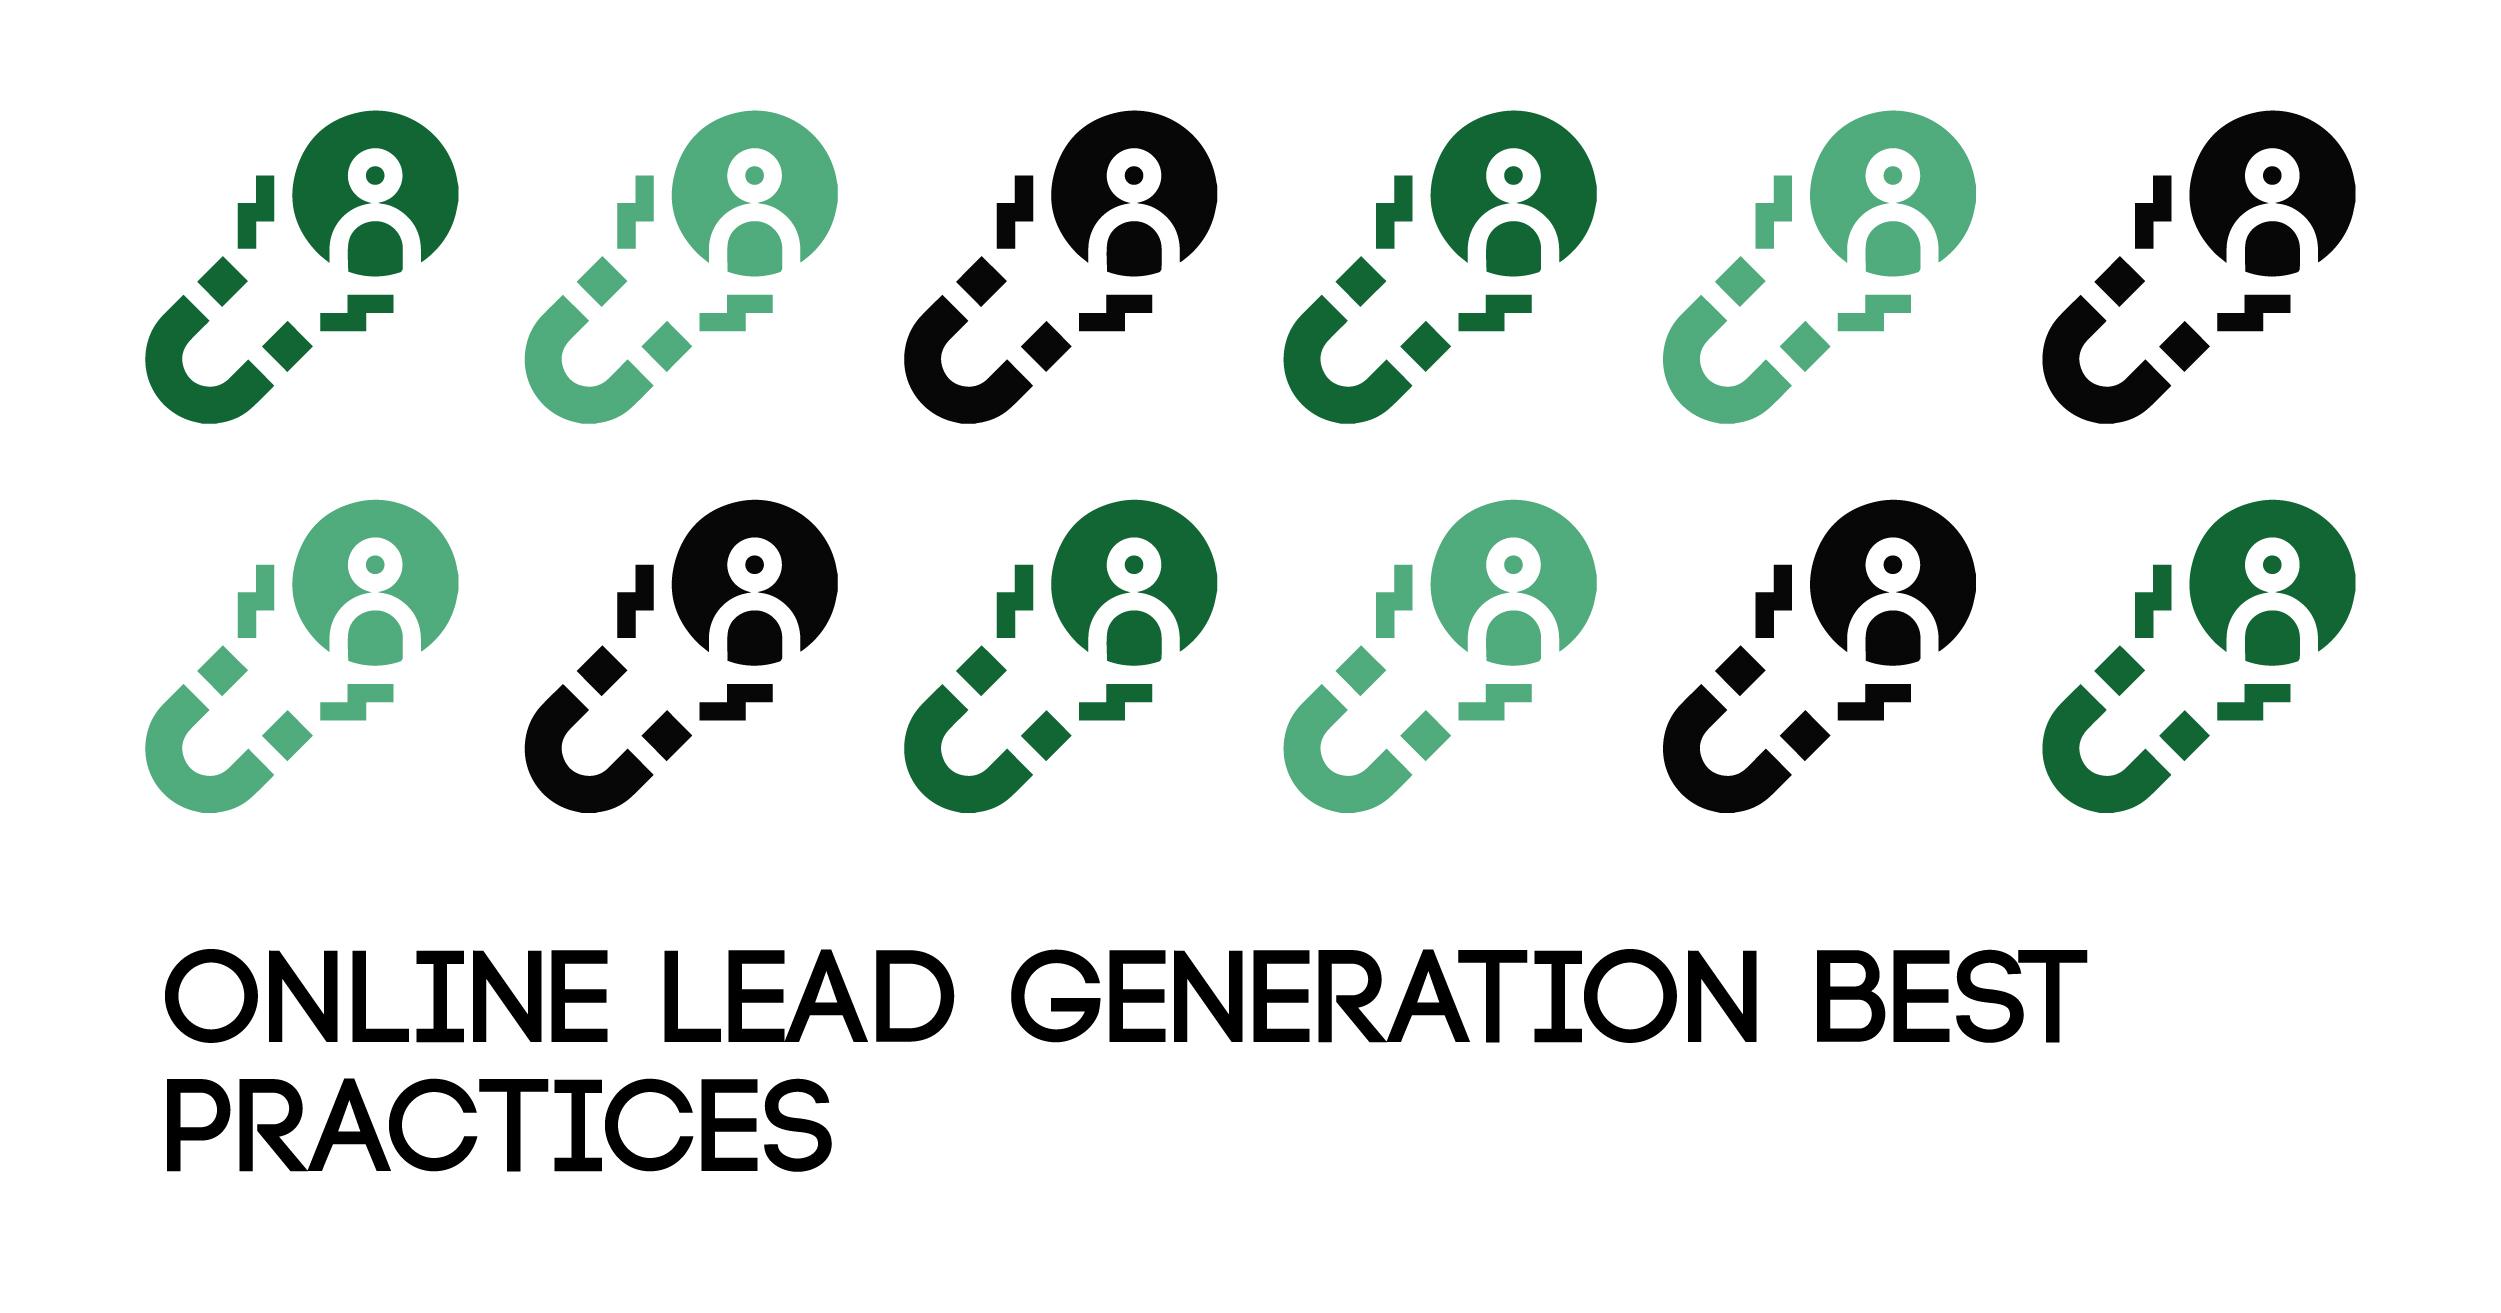 Online Lead Generation Best Practices